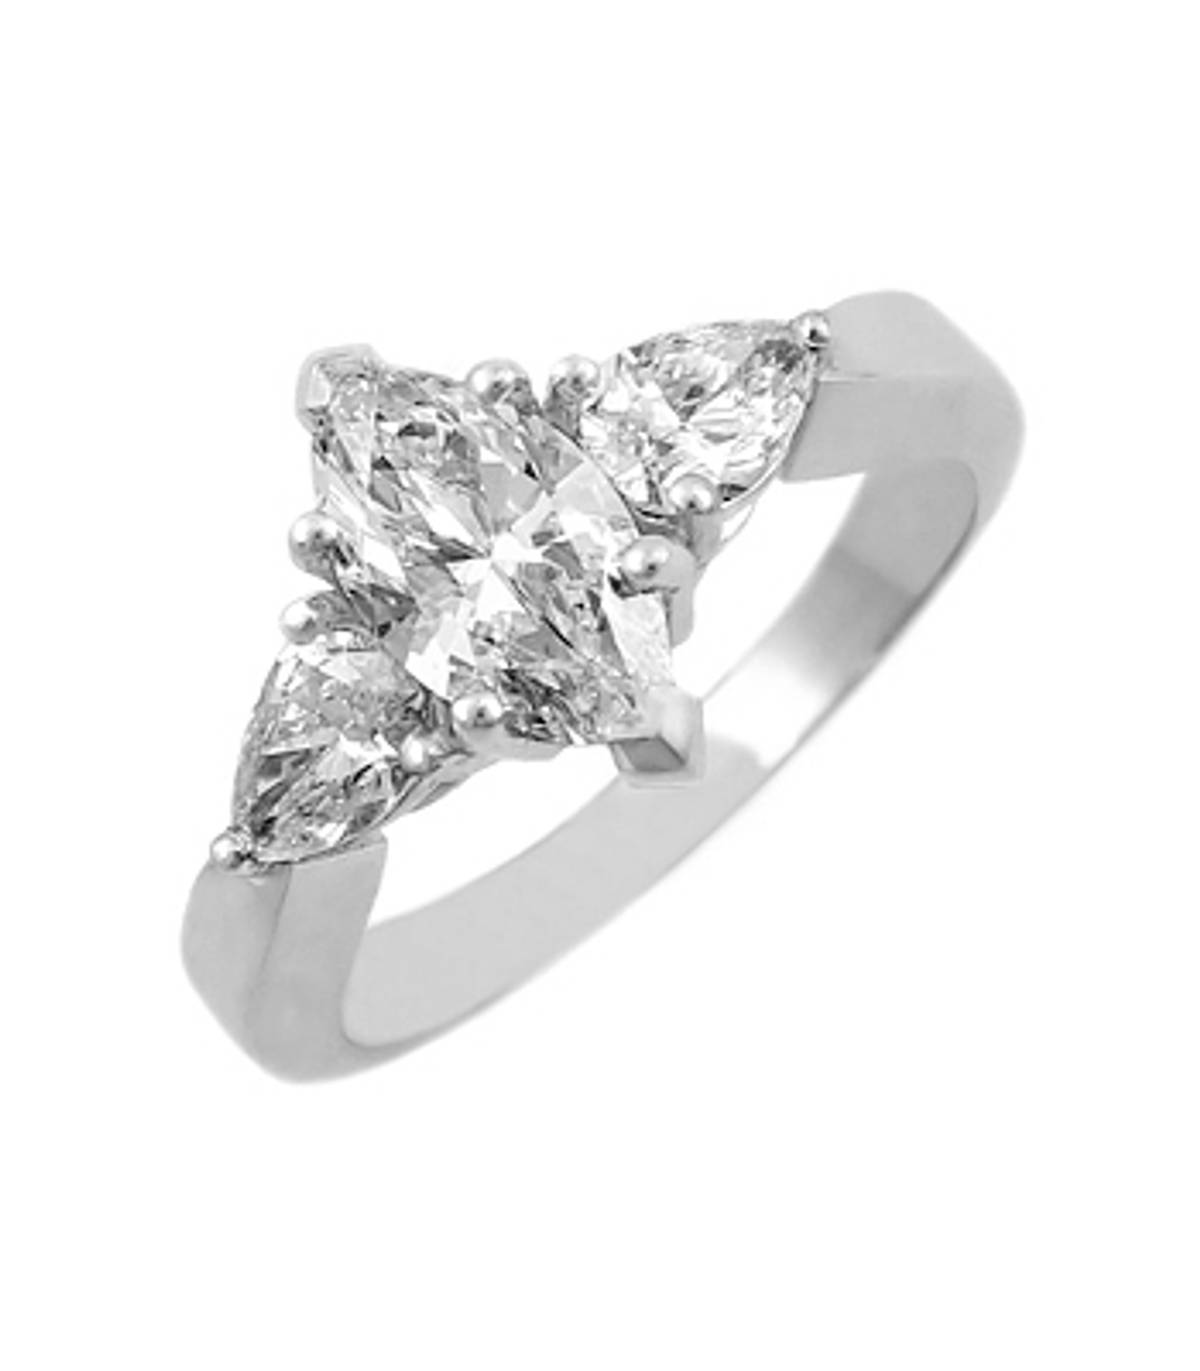 3 STONE DIAMOND RING 18k white gold 3st marquise & pearshape diamond ringDETAILSCarat: centre diamond 0.90cts / side diamonds total 0.54ctsCut: Marquise & pear shapeMetal: 18k white gold